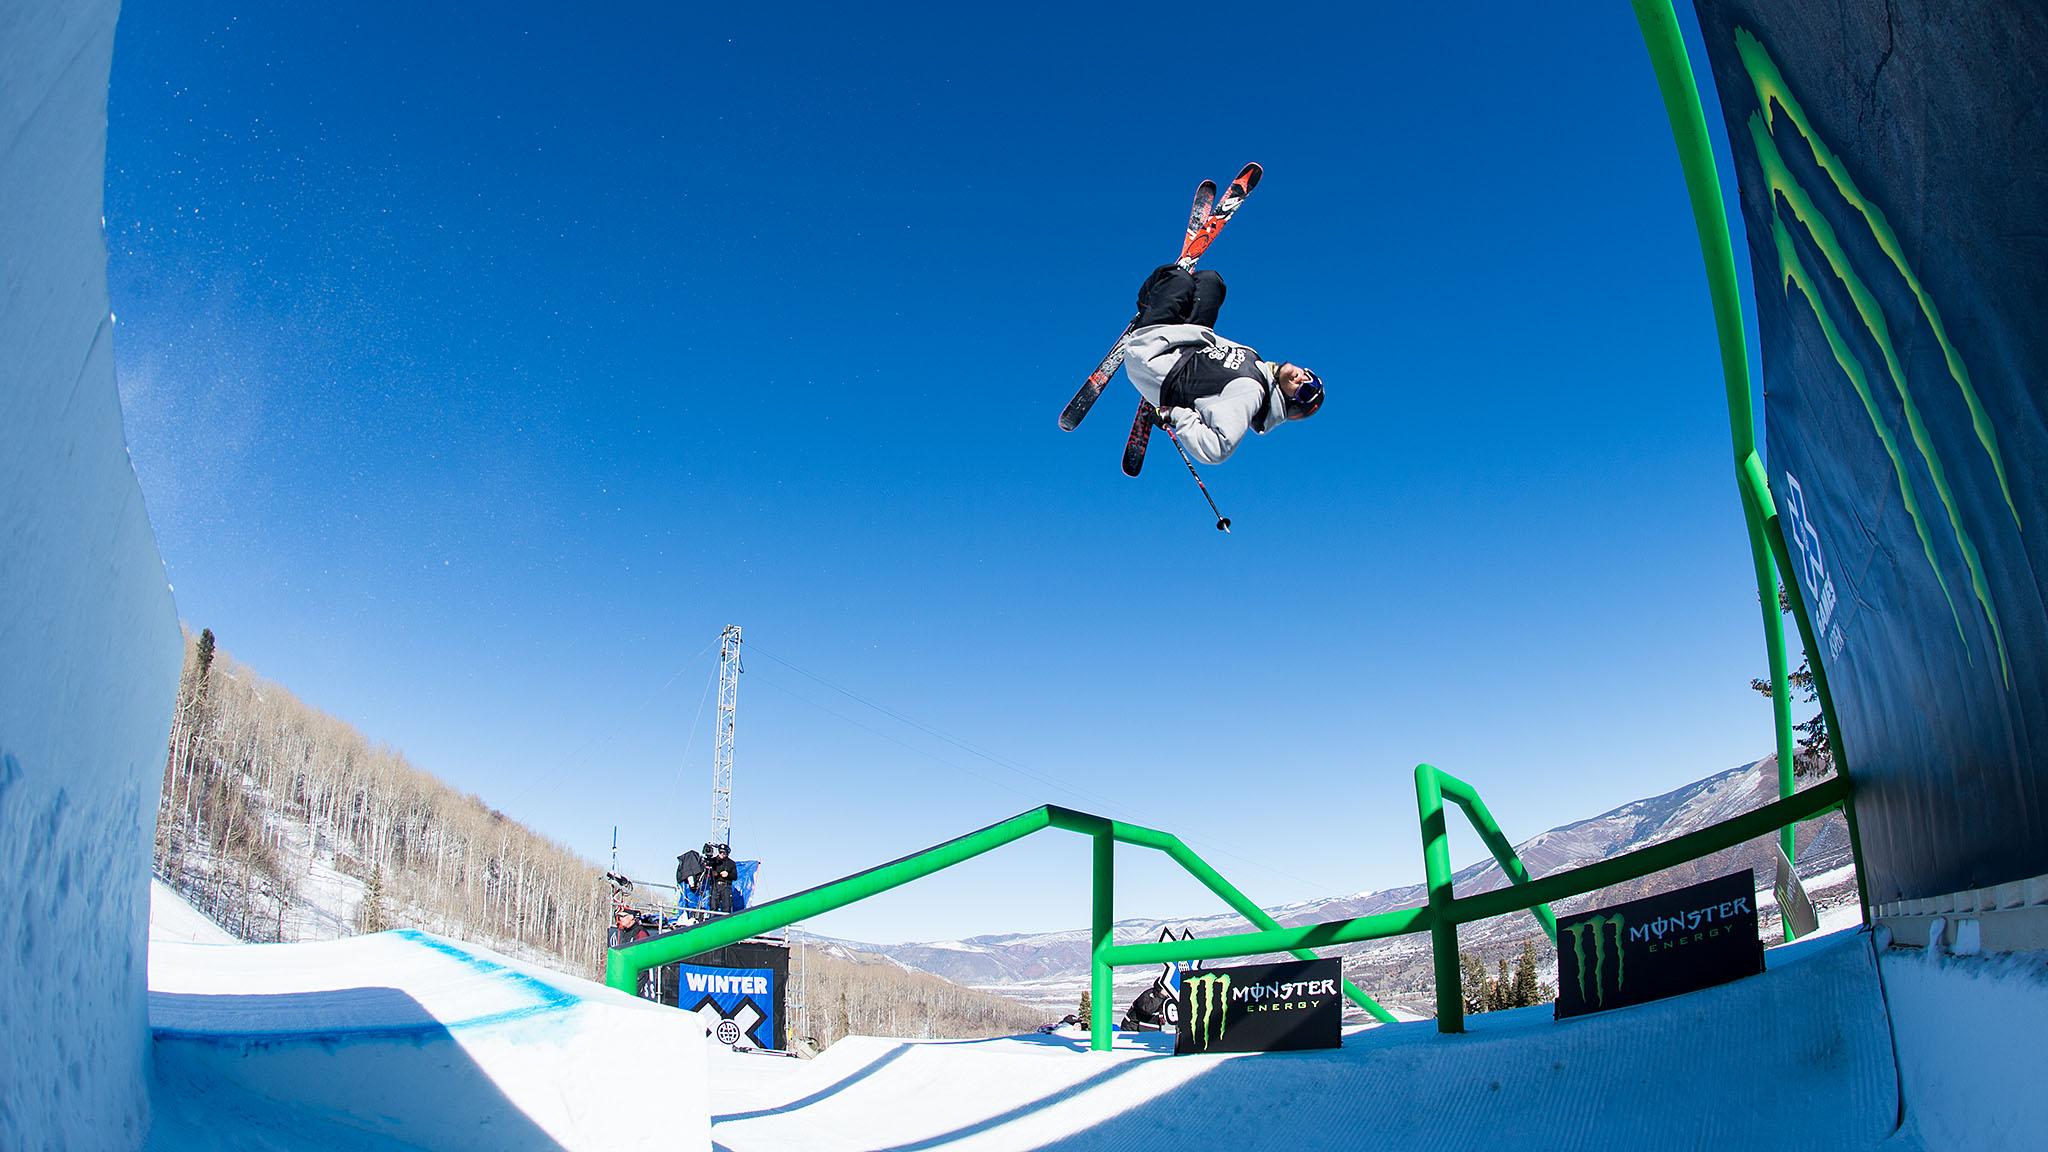 Andreas Htveit, Ski Slopestyle